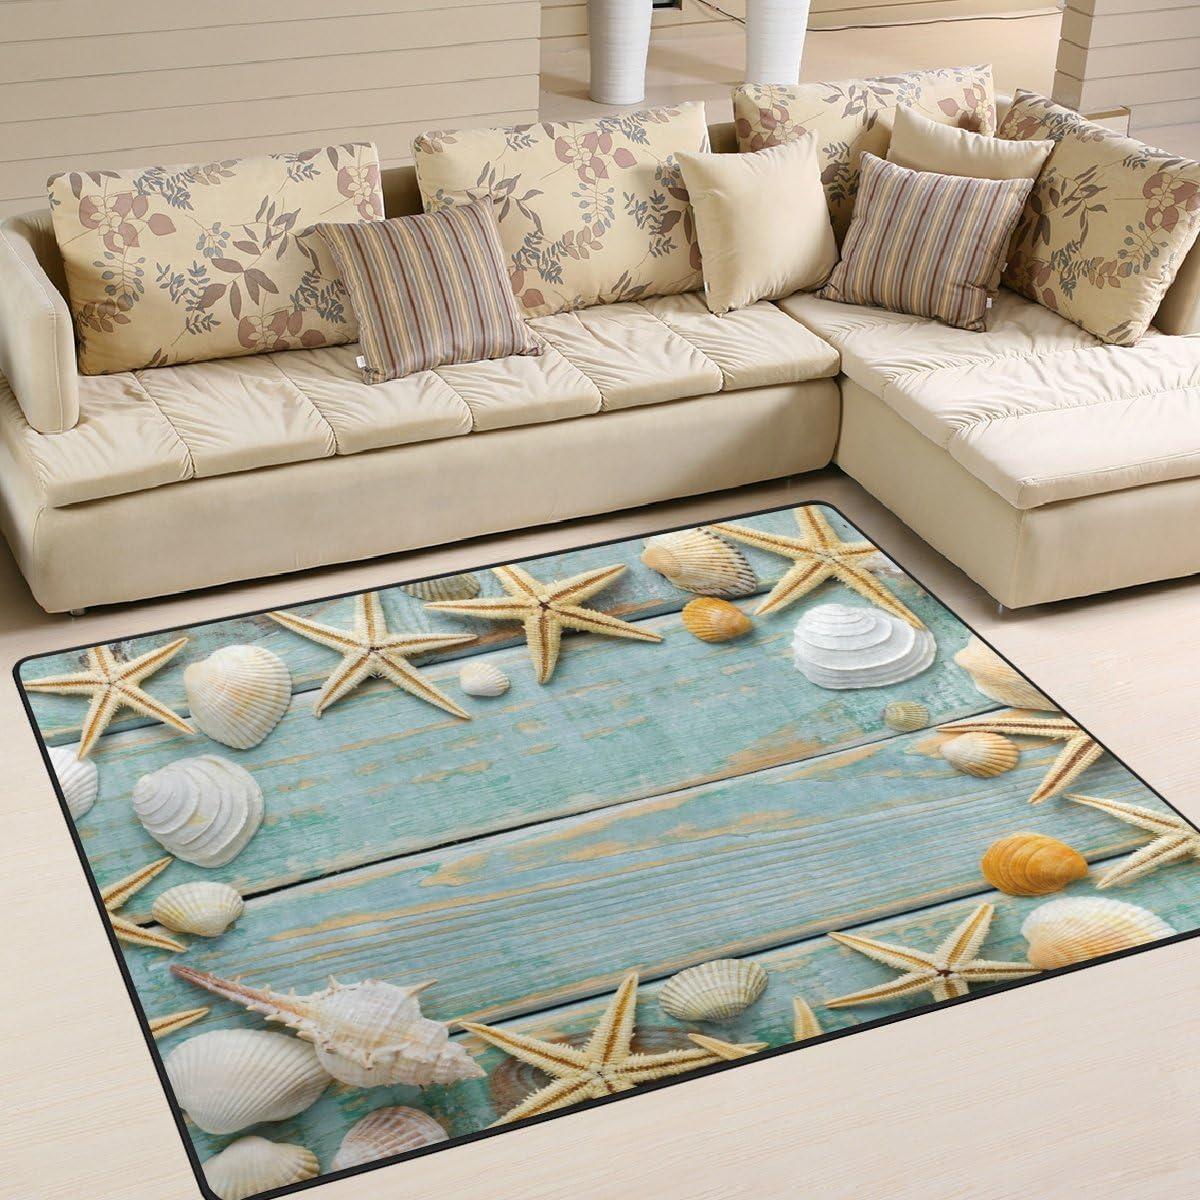 Cooper Girl Tropical 年中無休 Beach Seashell Rug Mat Carpet [再販ご予約限定送料無料] Area 6'8